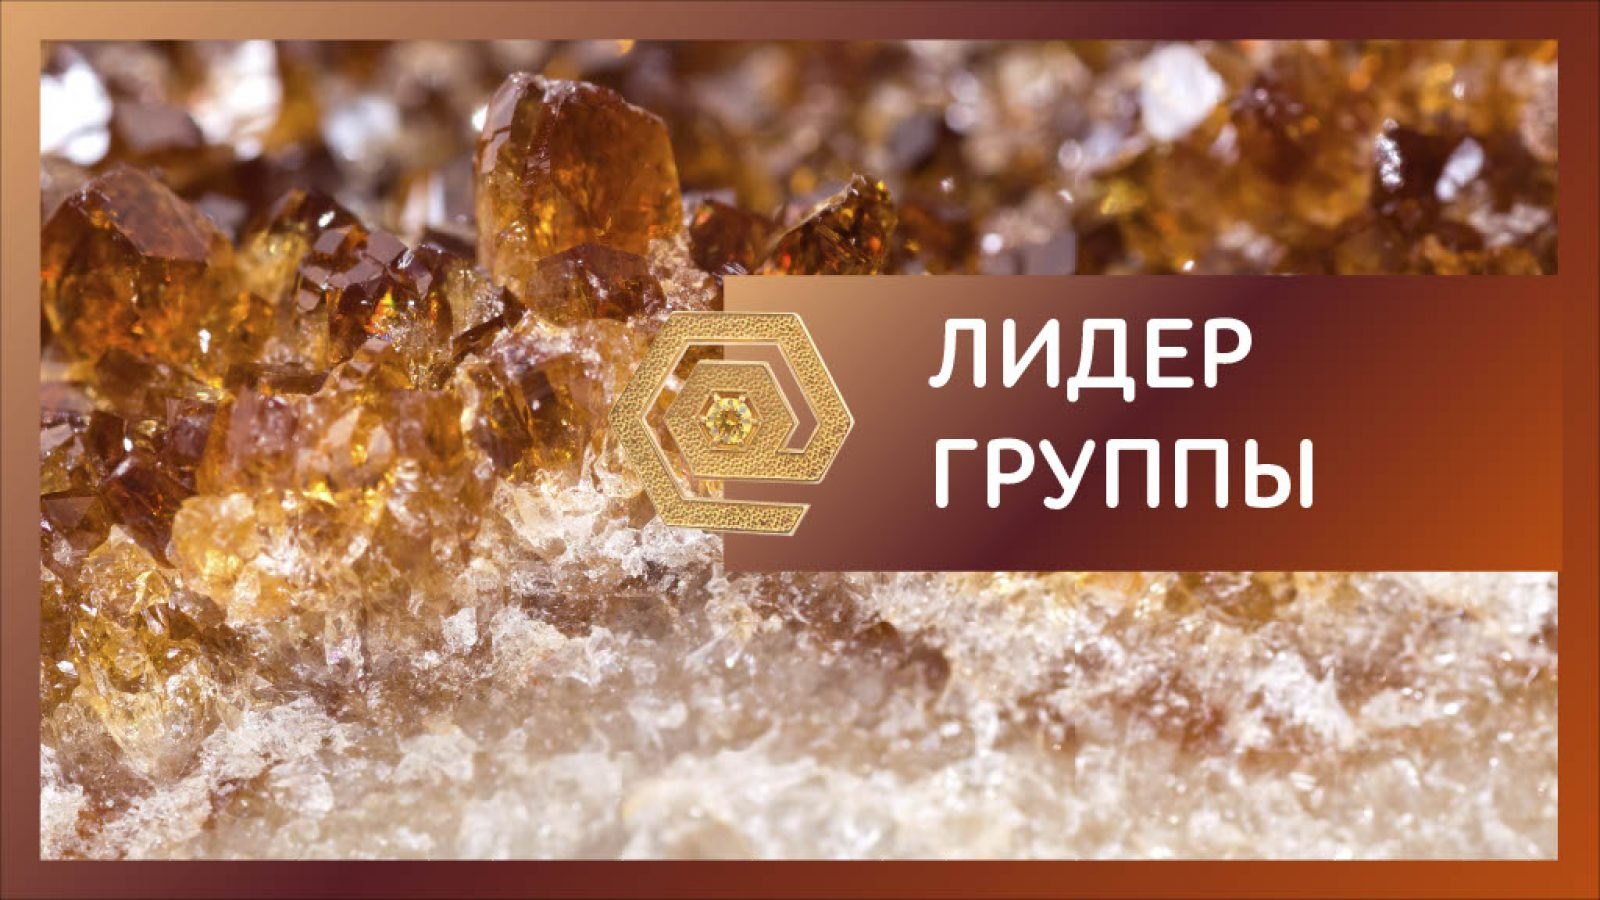 SHTV-2020-_-E-TL-TBTV-TVTGTBTL-TL-TB-TB-_69-TBTVTA1024_42